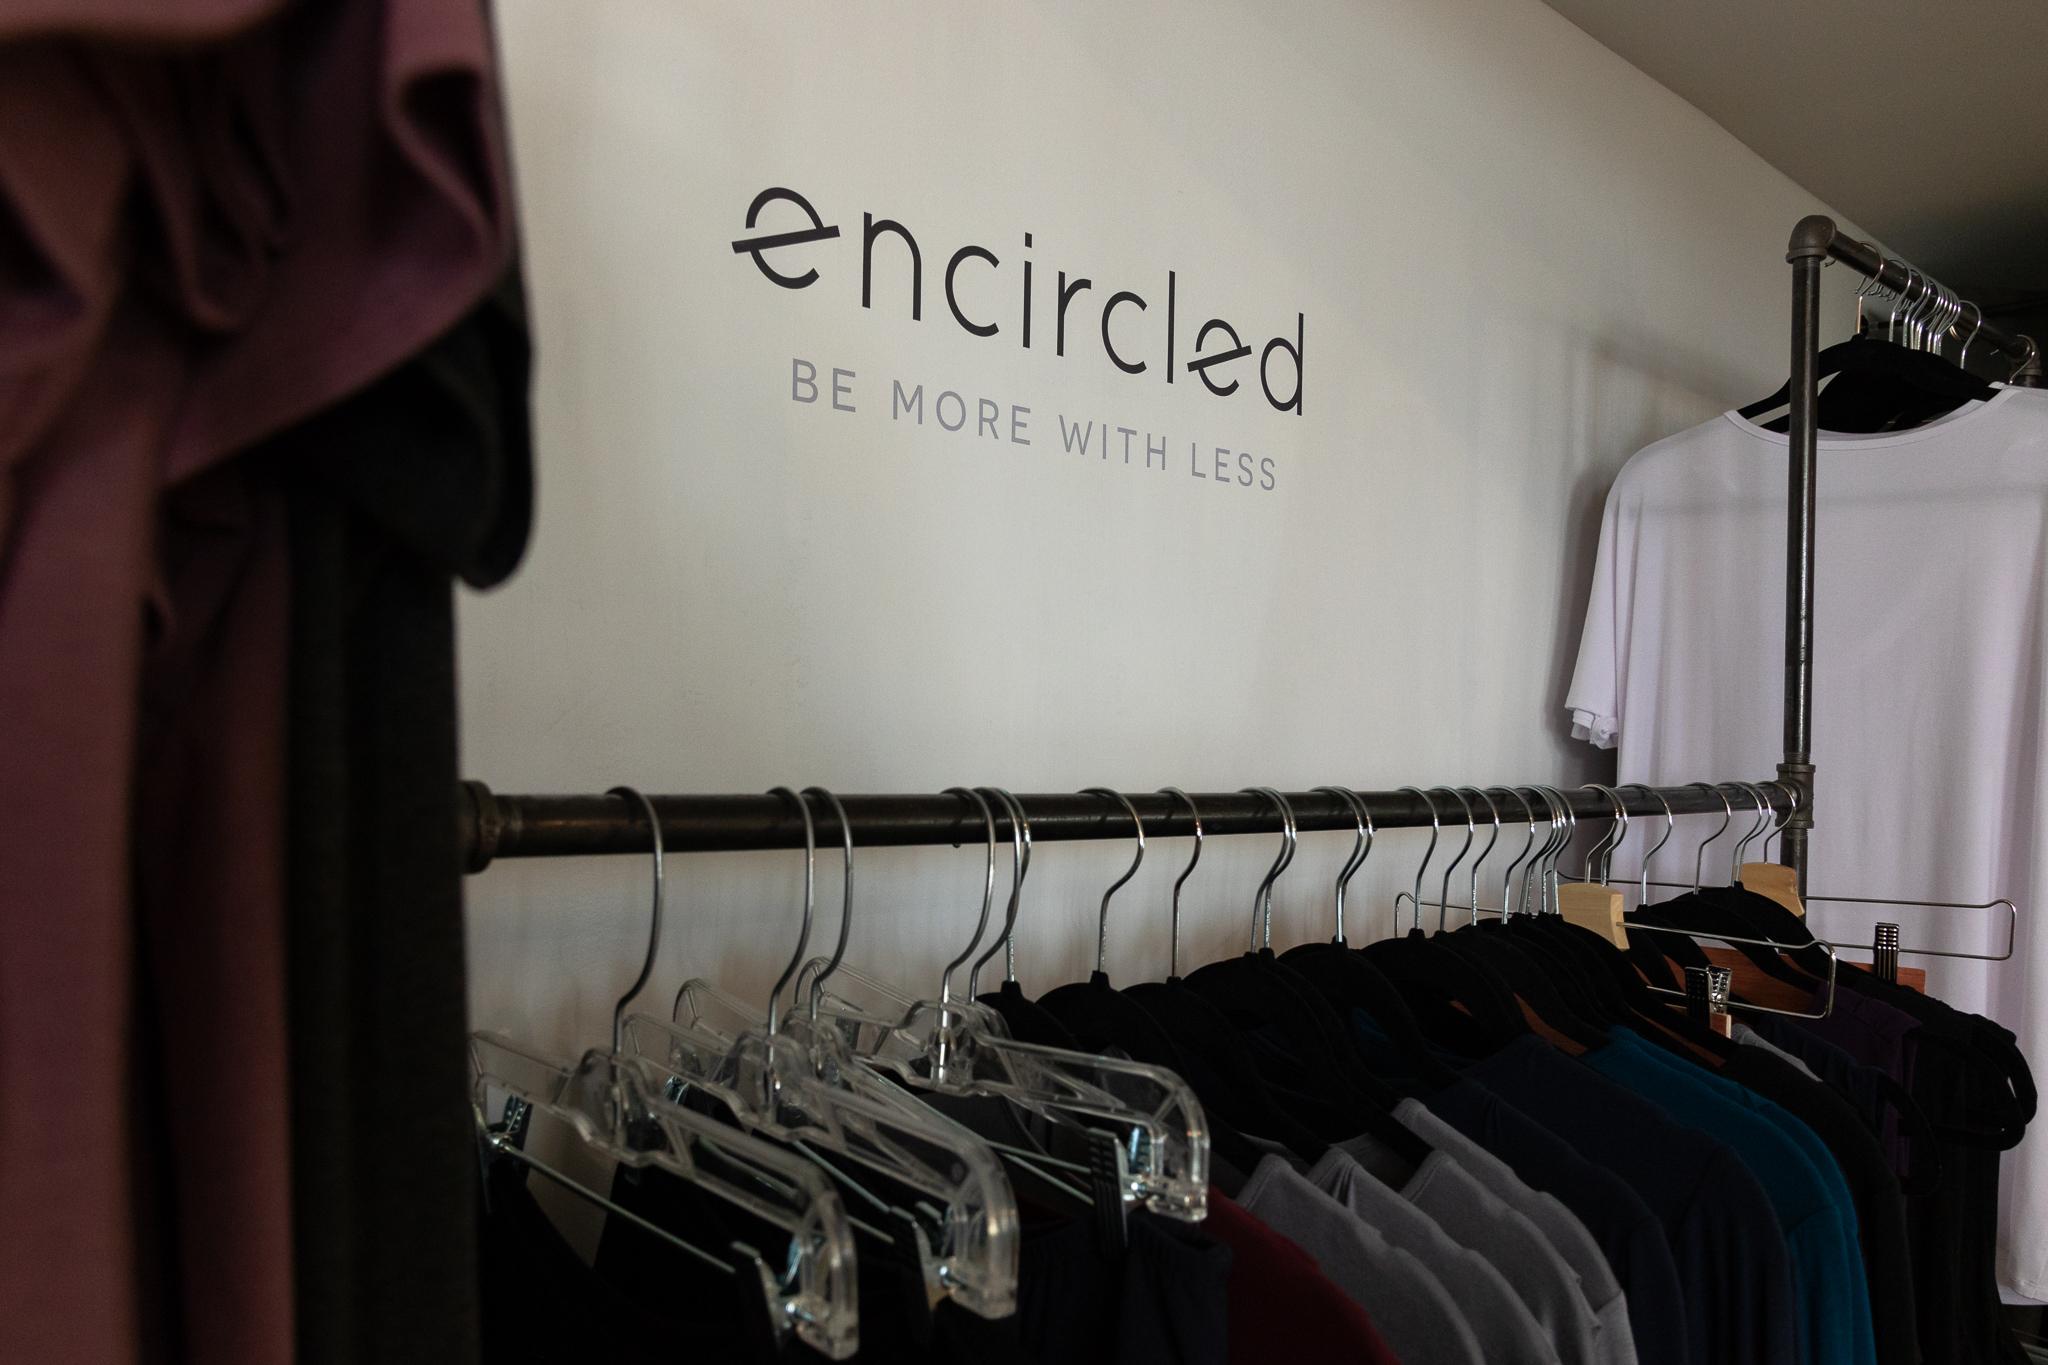 clothing rack at encircled studio shop in toronto